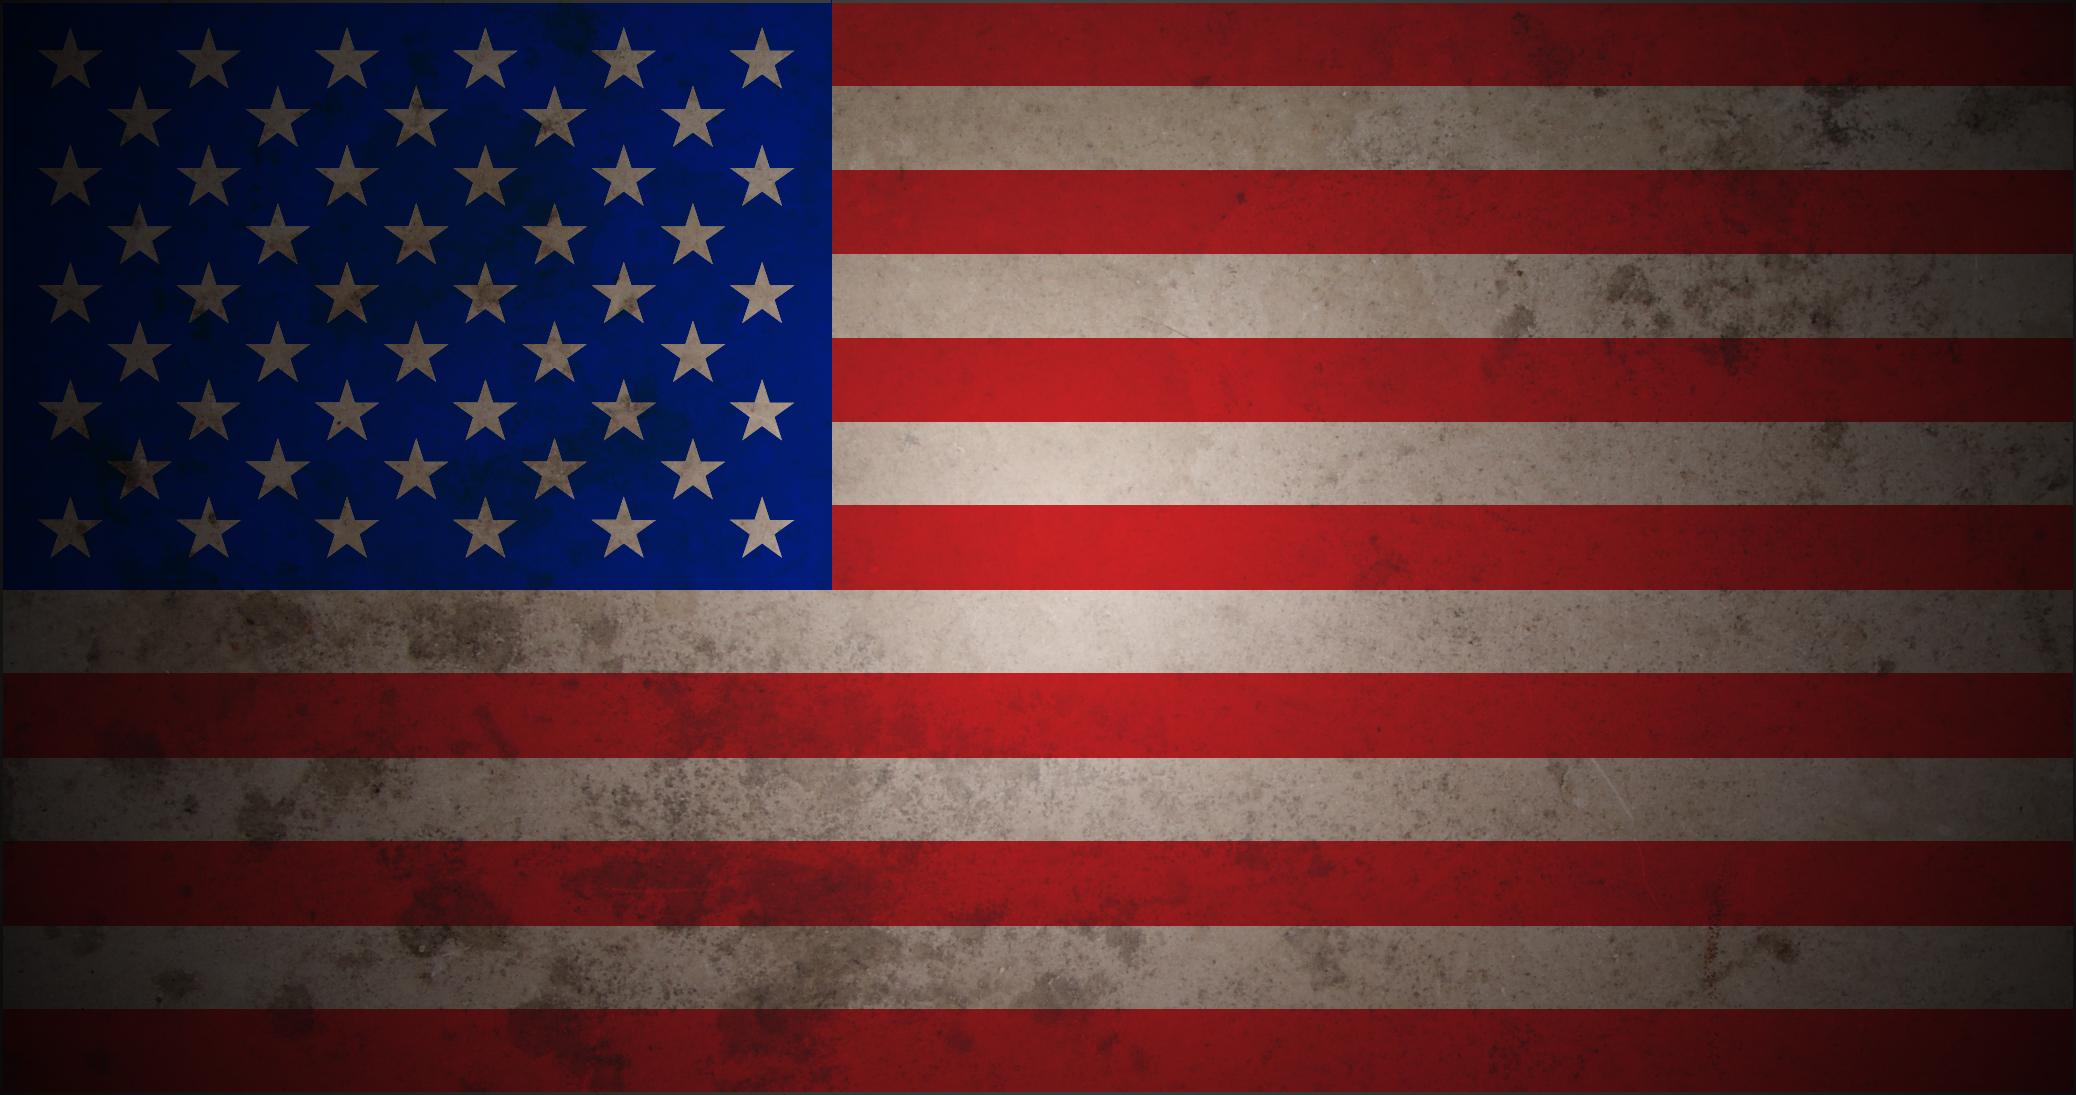 flags usa american flag desktop 2076x1095 hd wallpaper 157877png 2076x1095